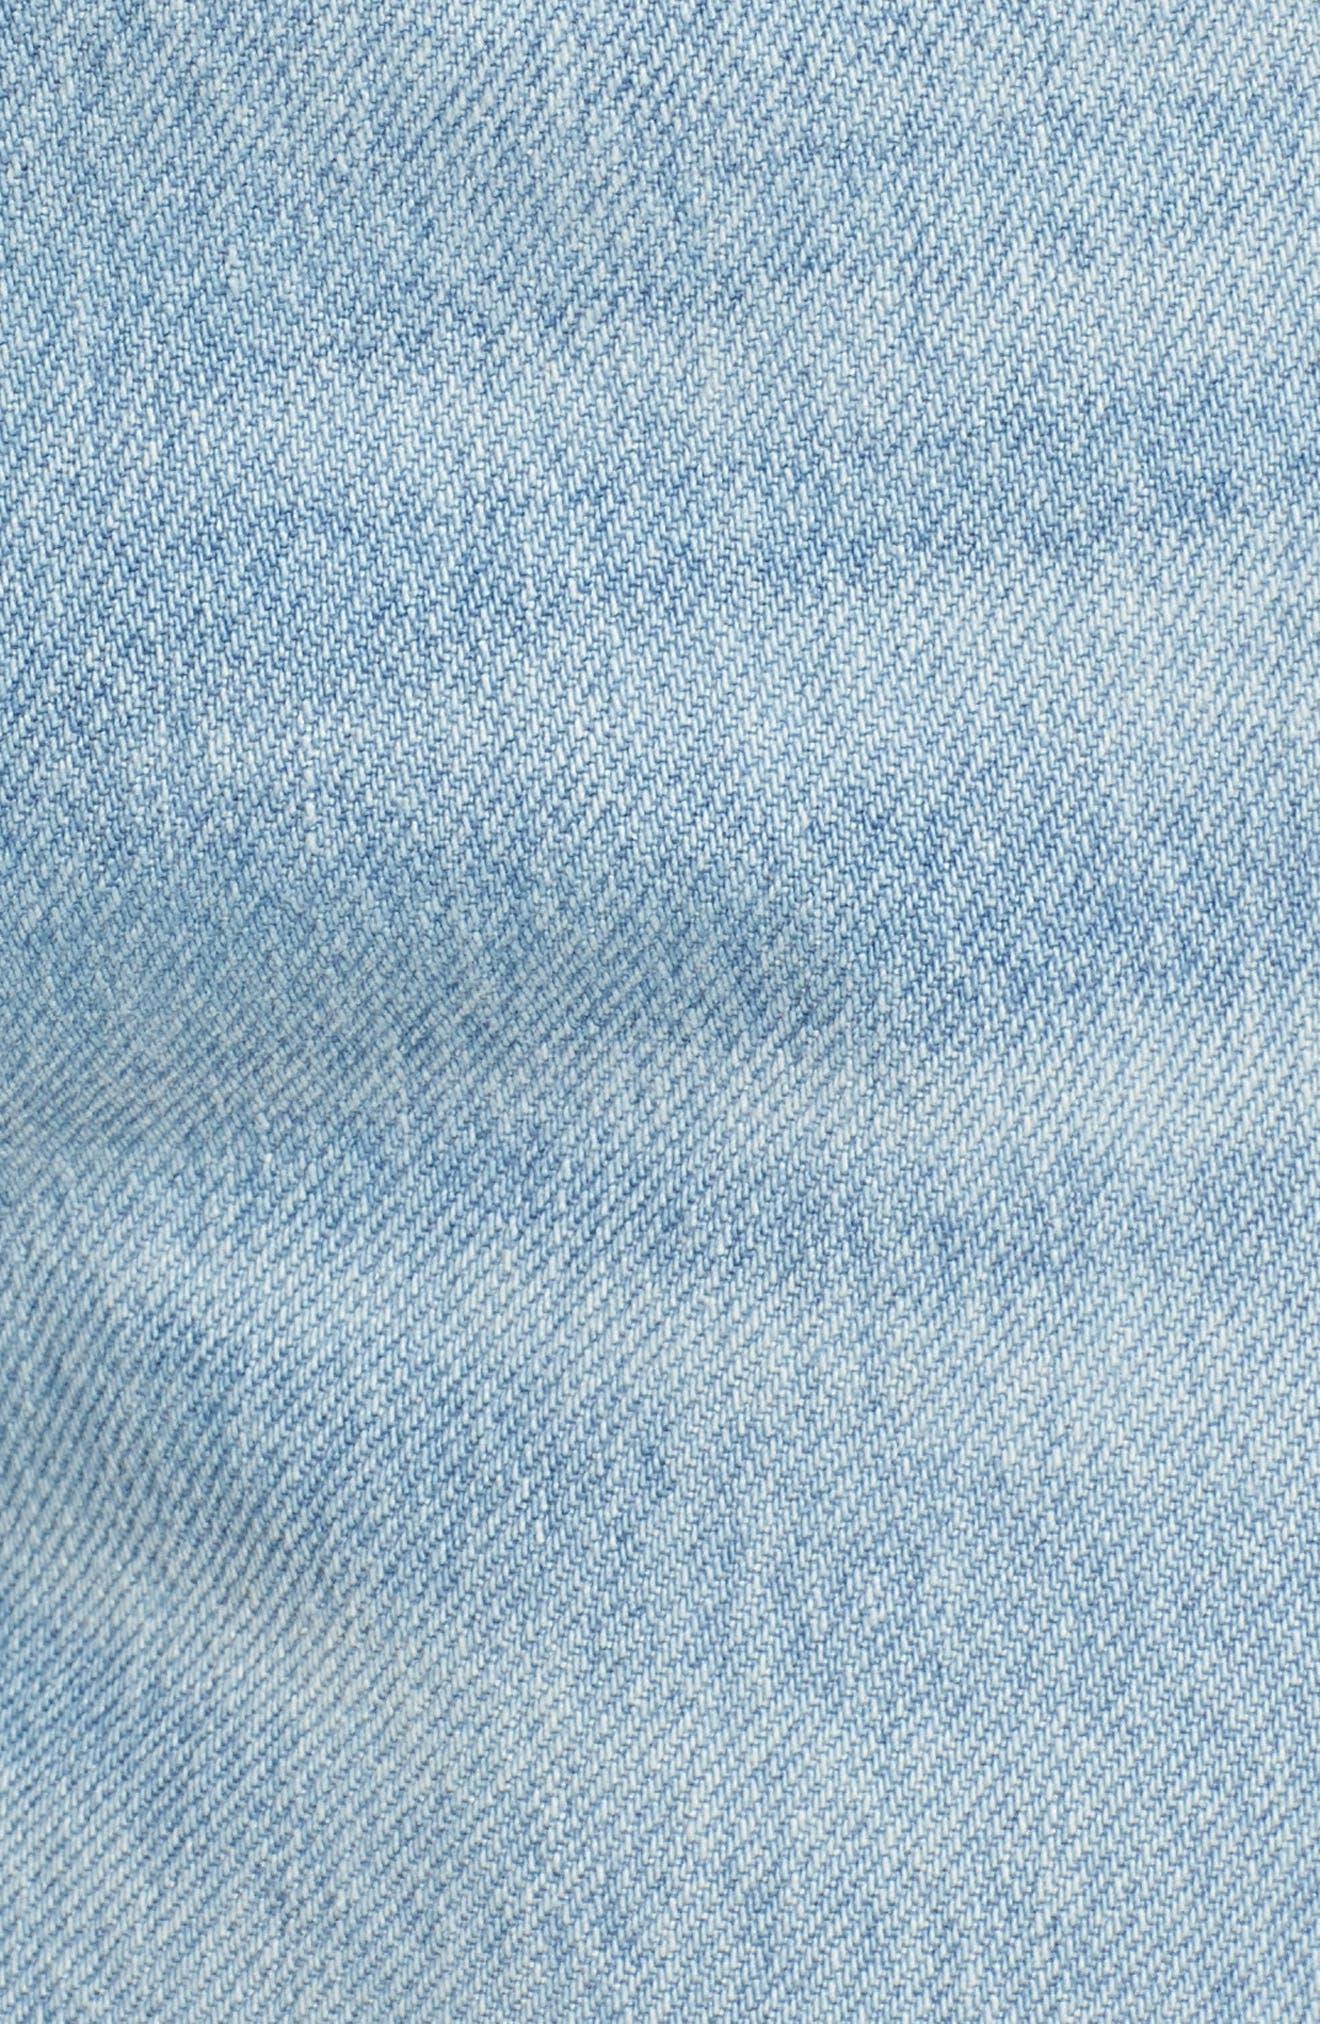 Jamie High Waist Ankle Jeans,                             Alternate thumbnail 6, color,                             453